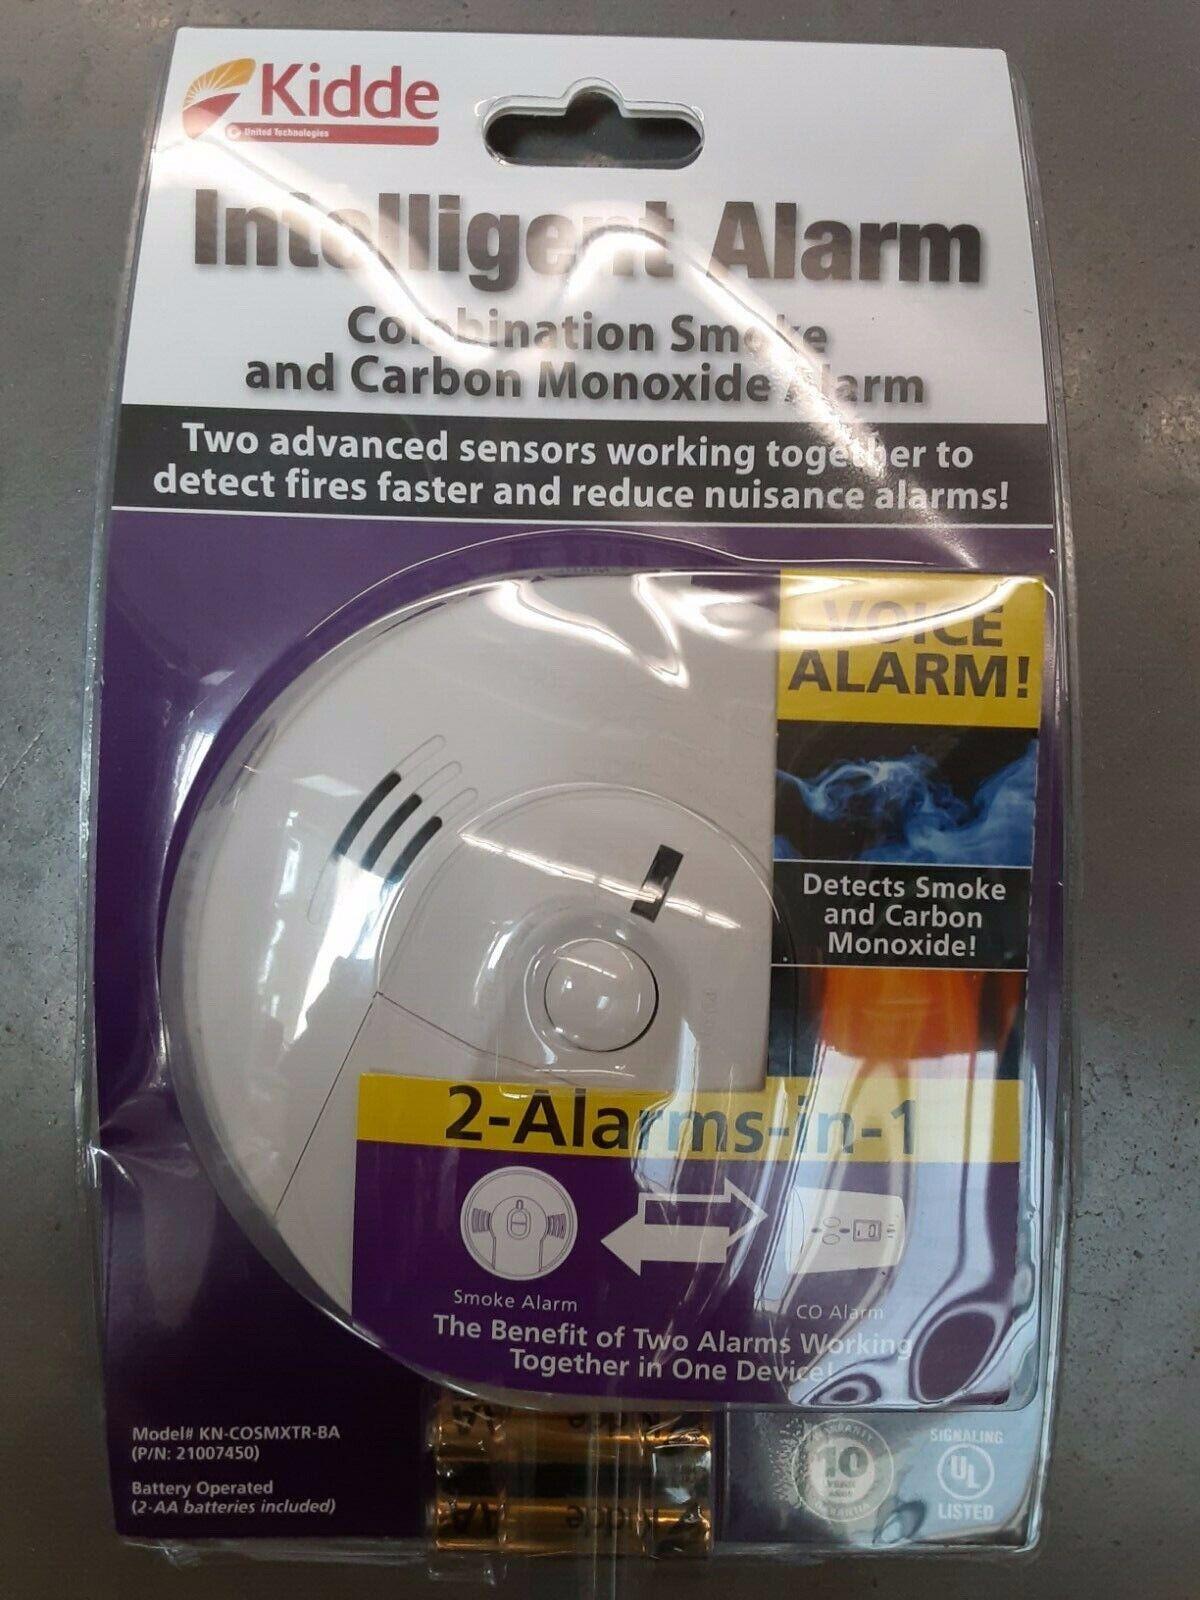 Kidde Intelligent Alarm Smoke And Carbon Monoxide Alarm - $23.00